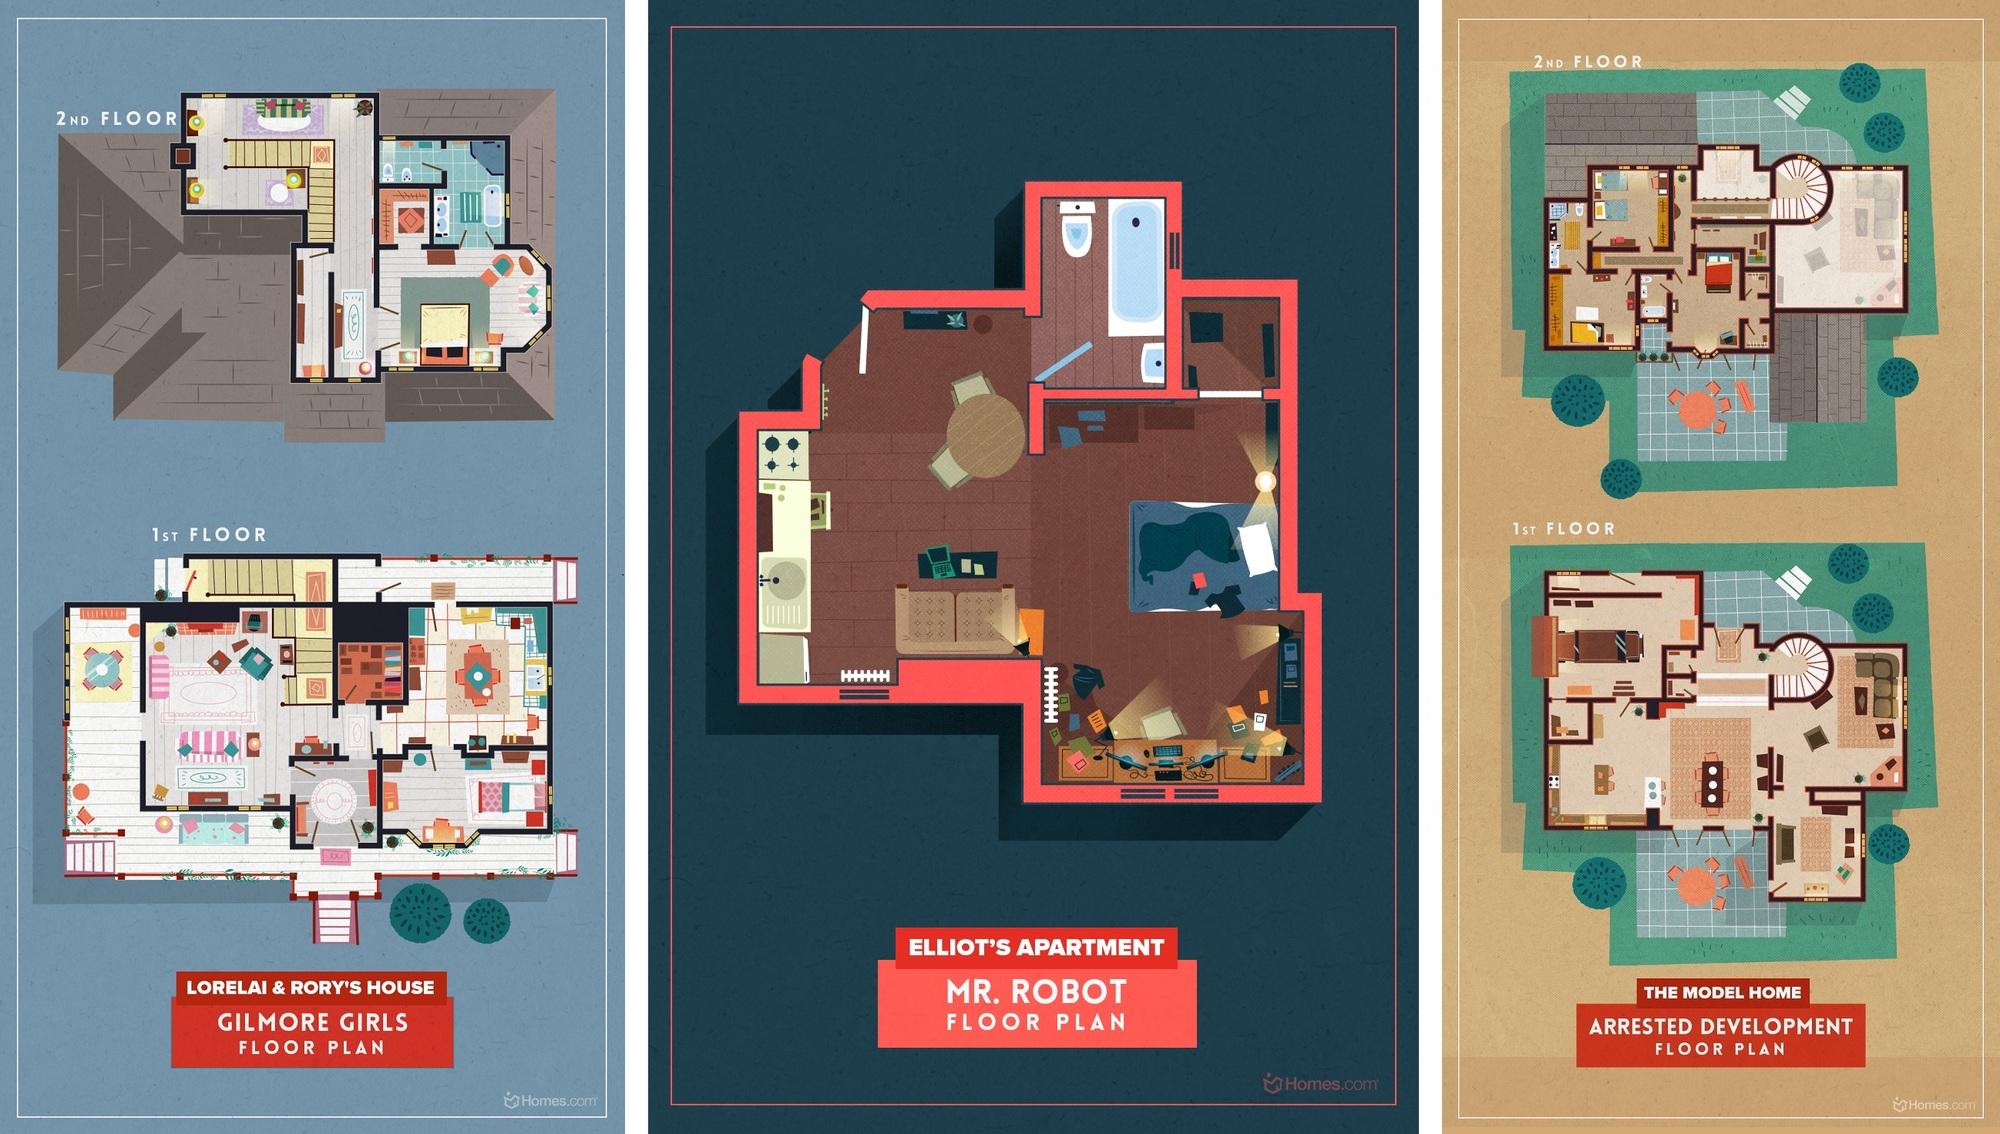 bluth model home floor plan home plan